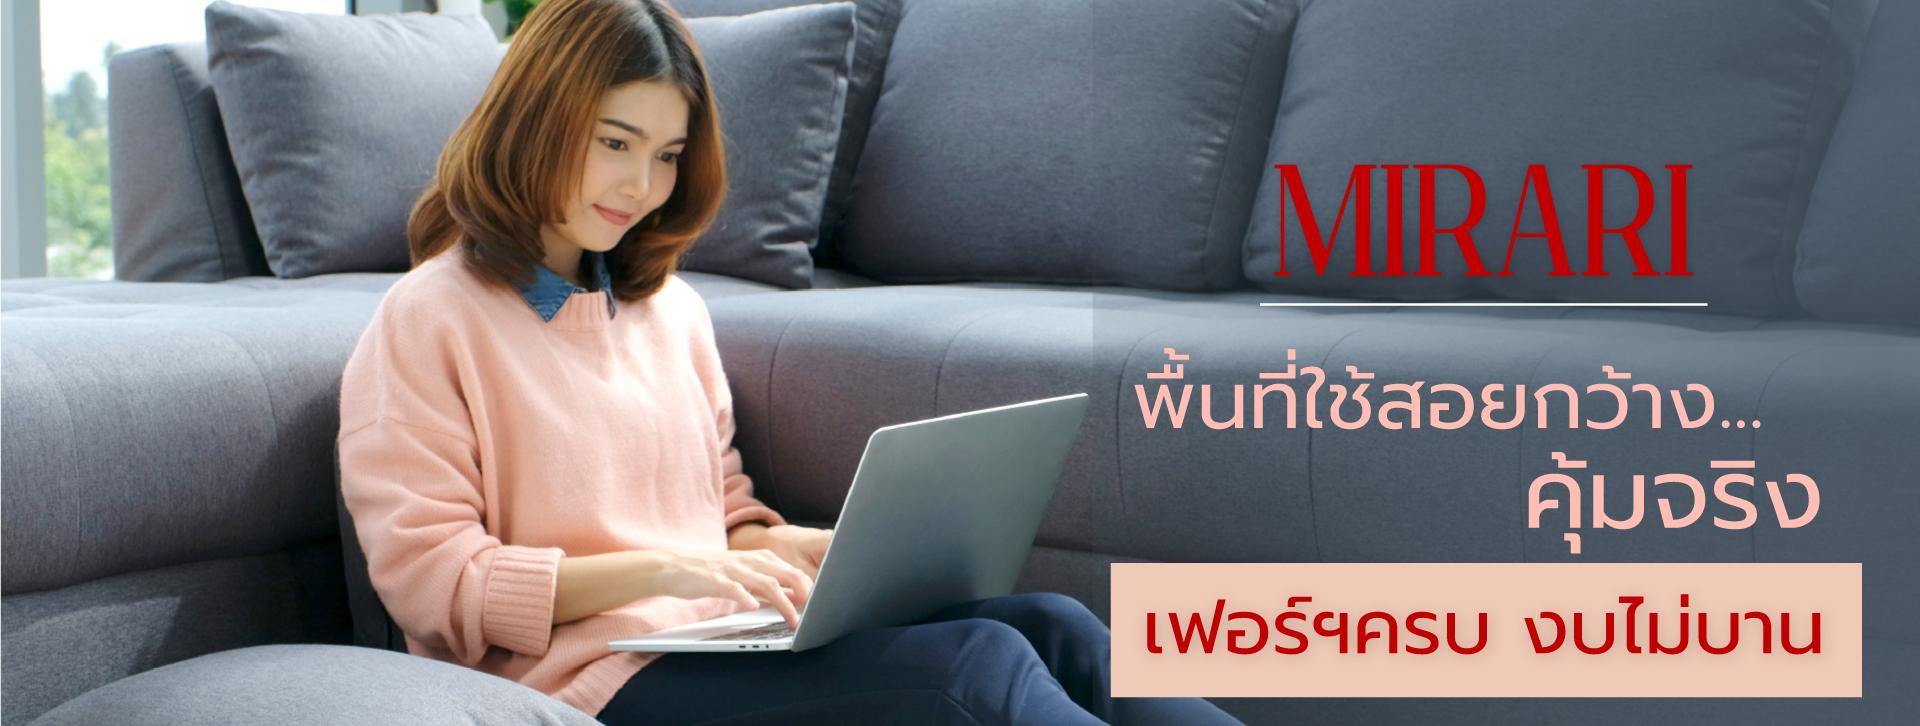 Mirari-Home_Banner-02_EDIT-16-Aug